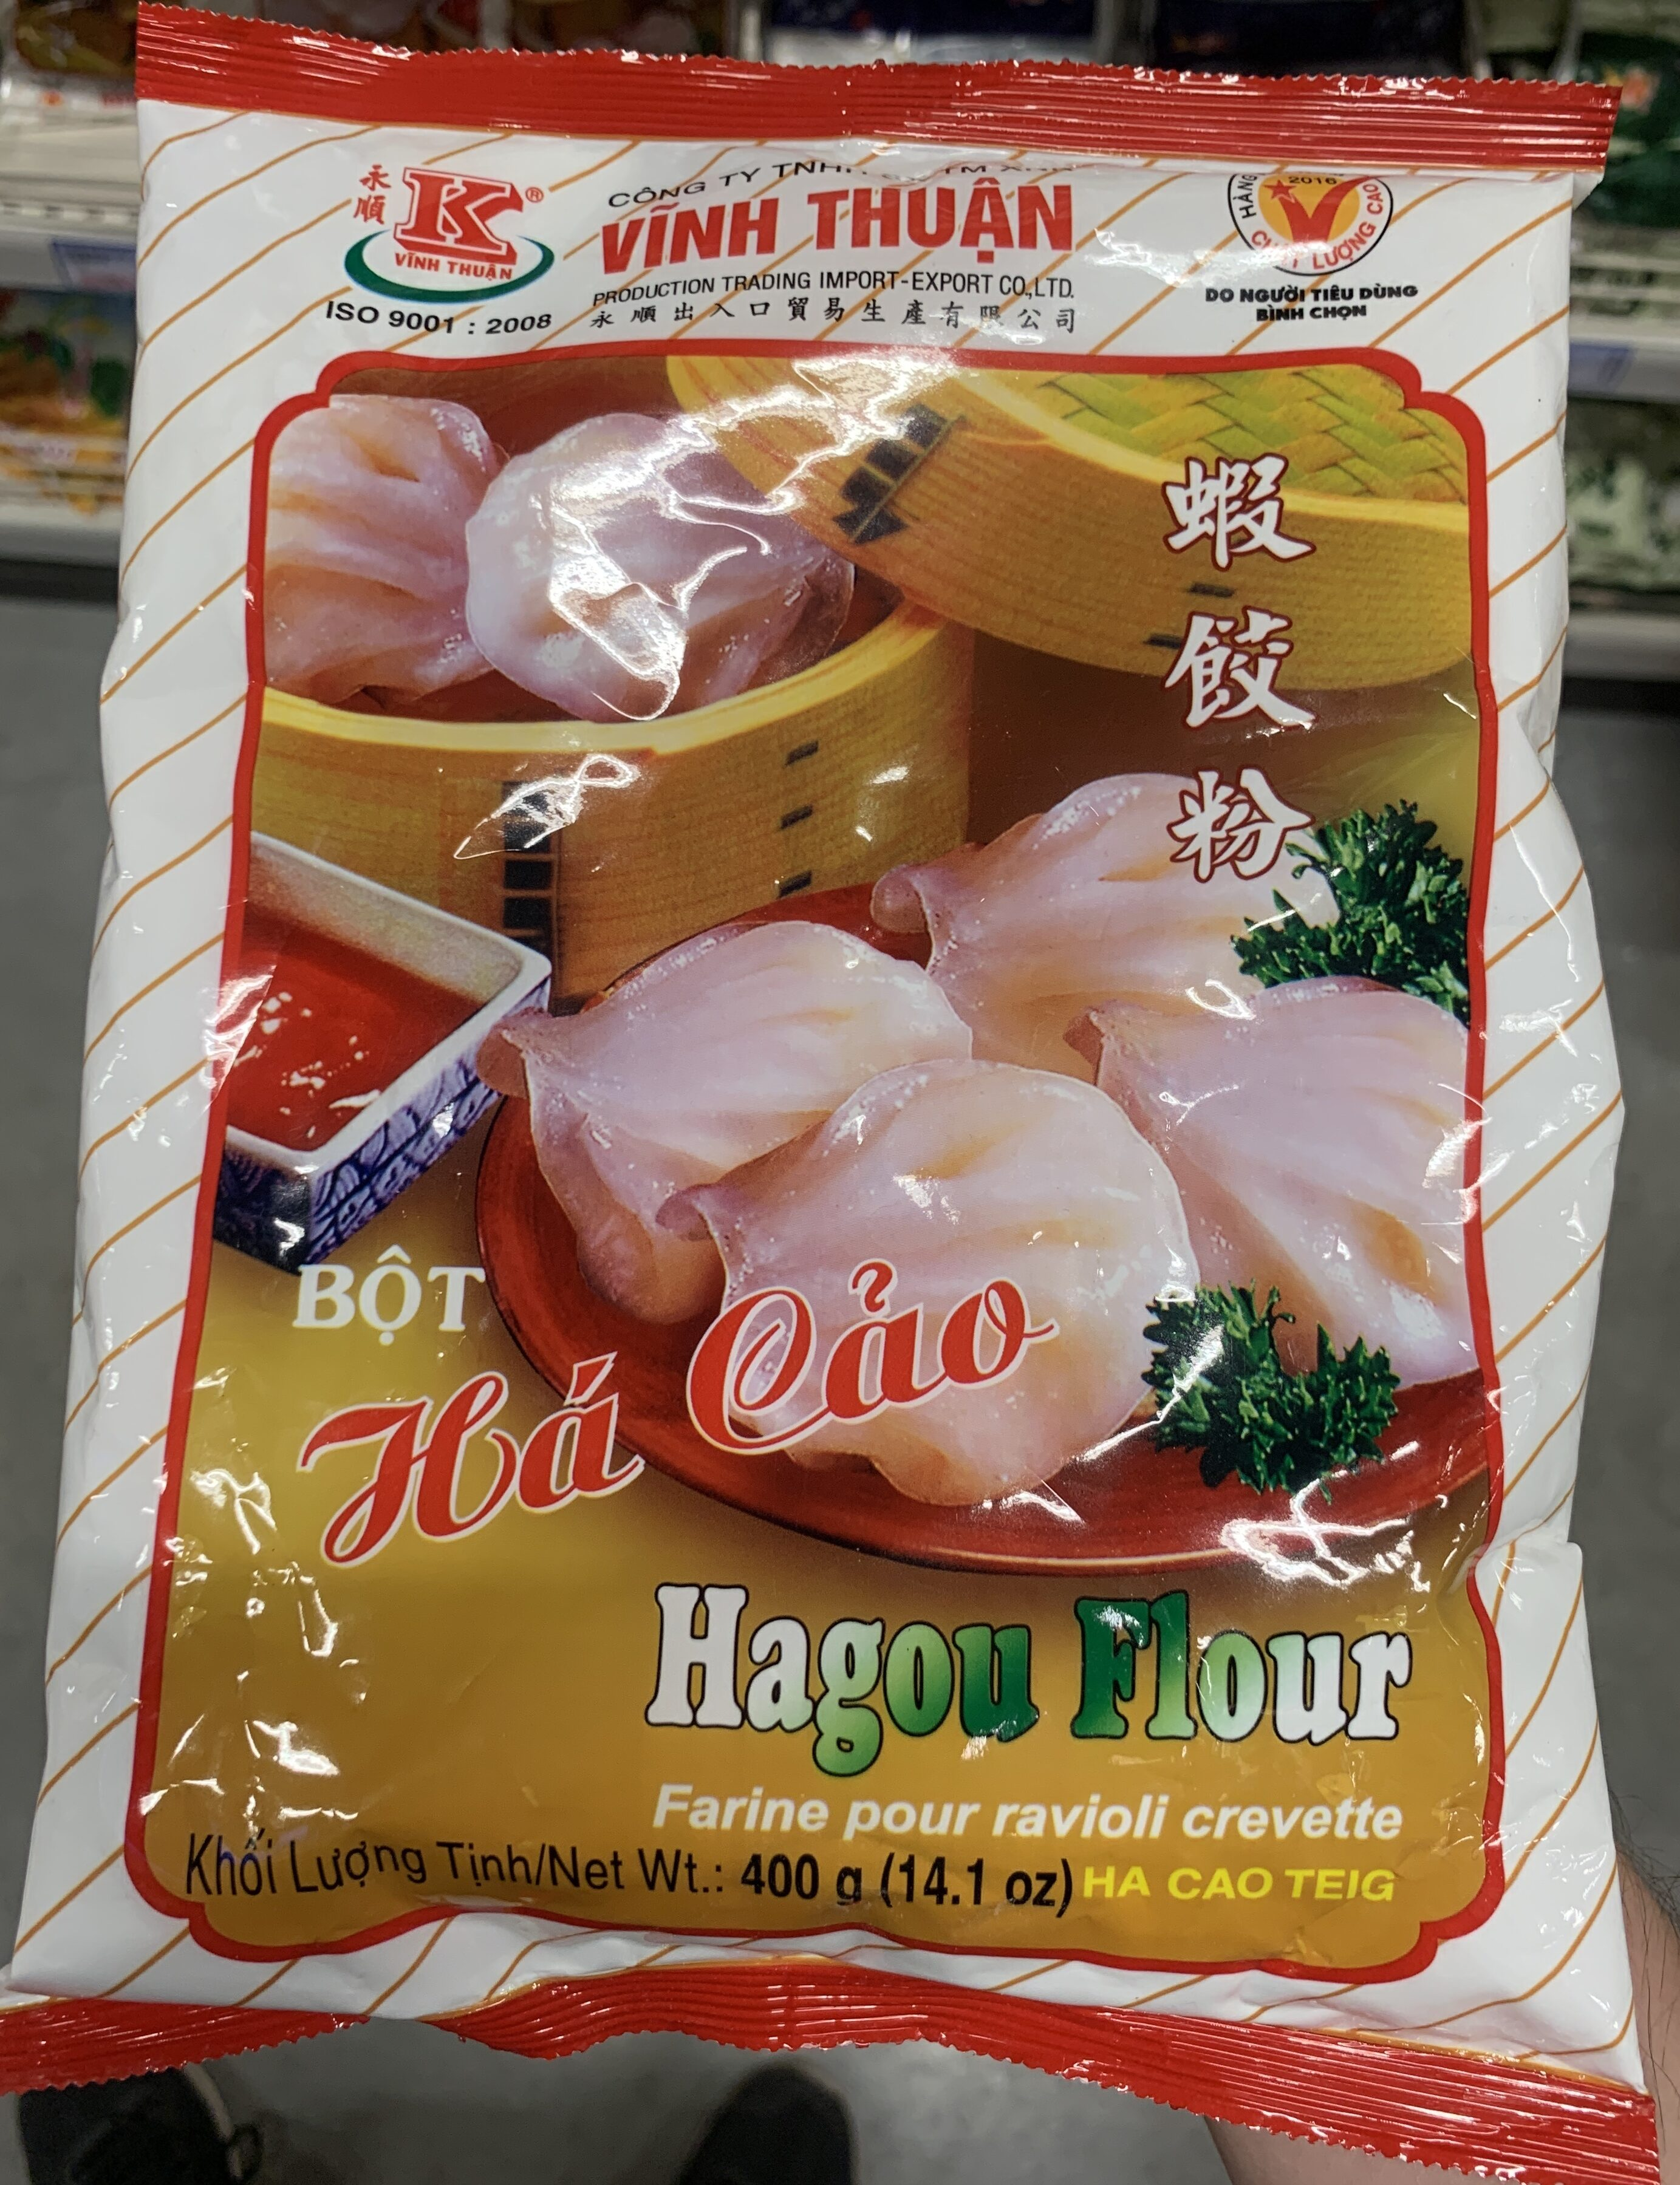 Farine pour ravioli crevette - Product - fr